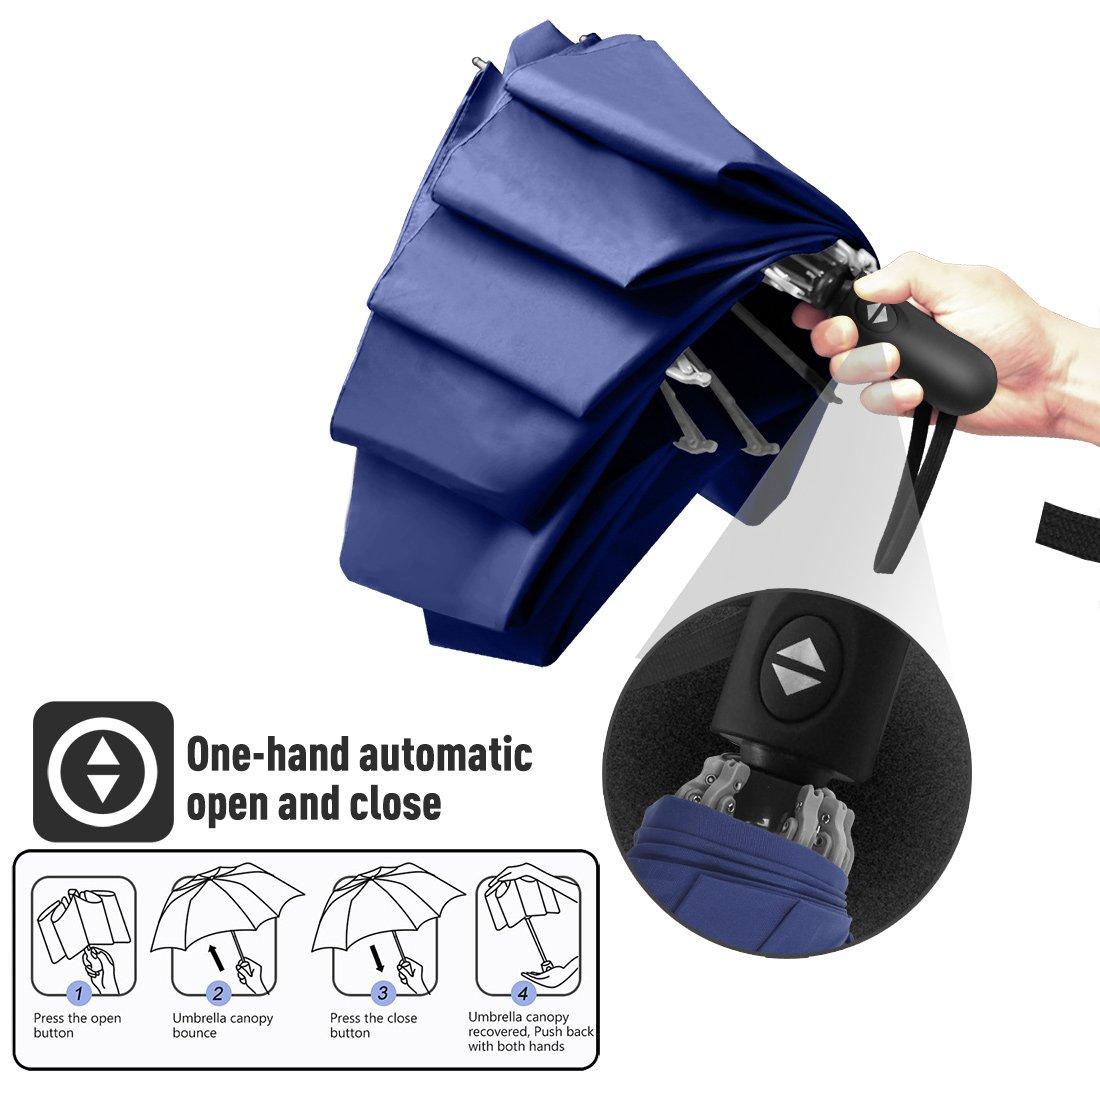 Nesus Umbrella Windproof Travel Umbrella 8 Ribs Auto Open Close with Waterproof Canopy Compact Folding Reverse Umbrella(Blue) by Nesus (Image #3)